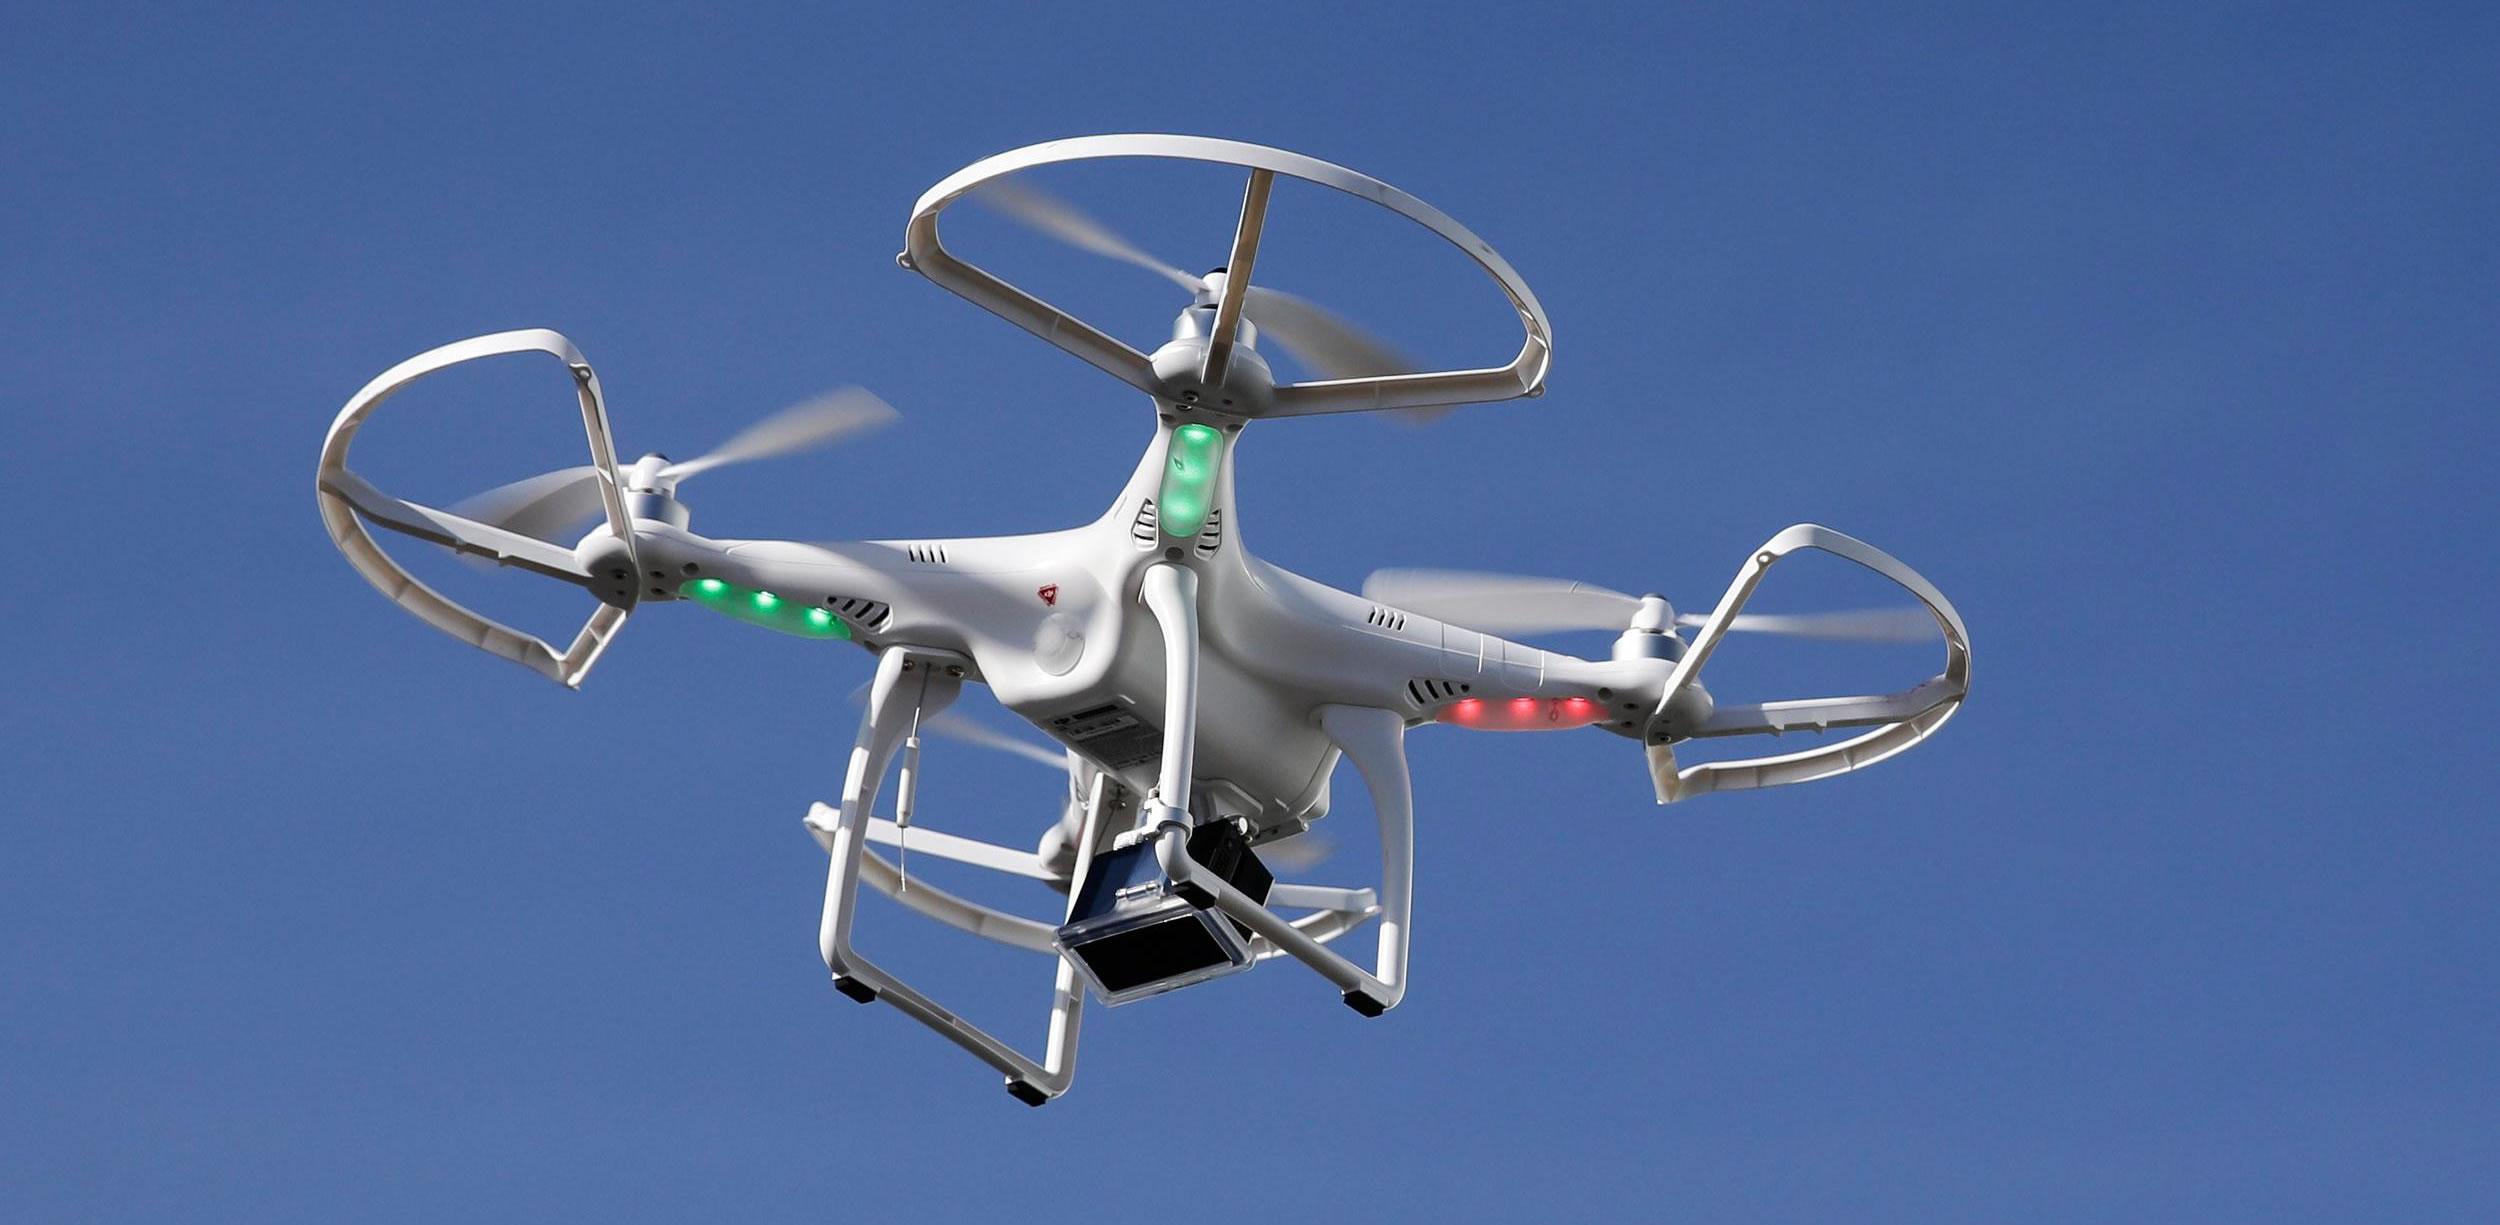 Drone legislation